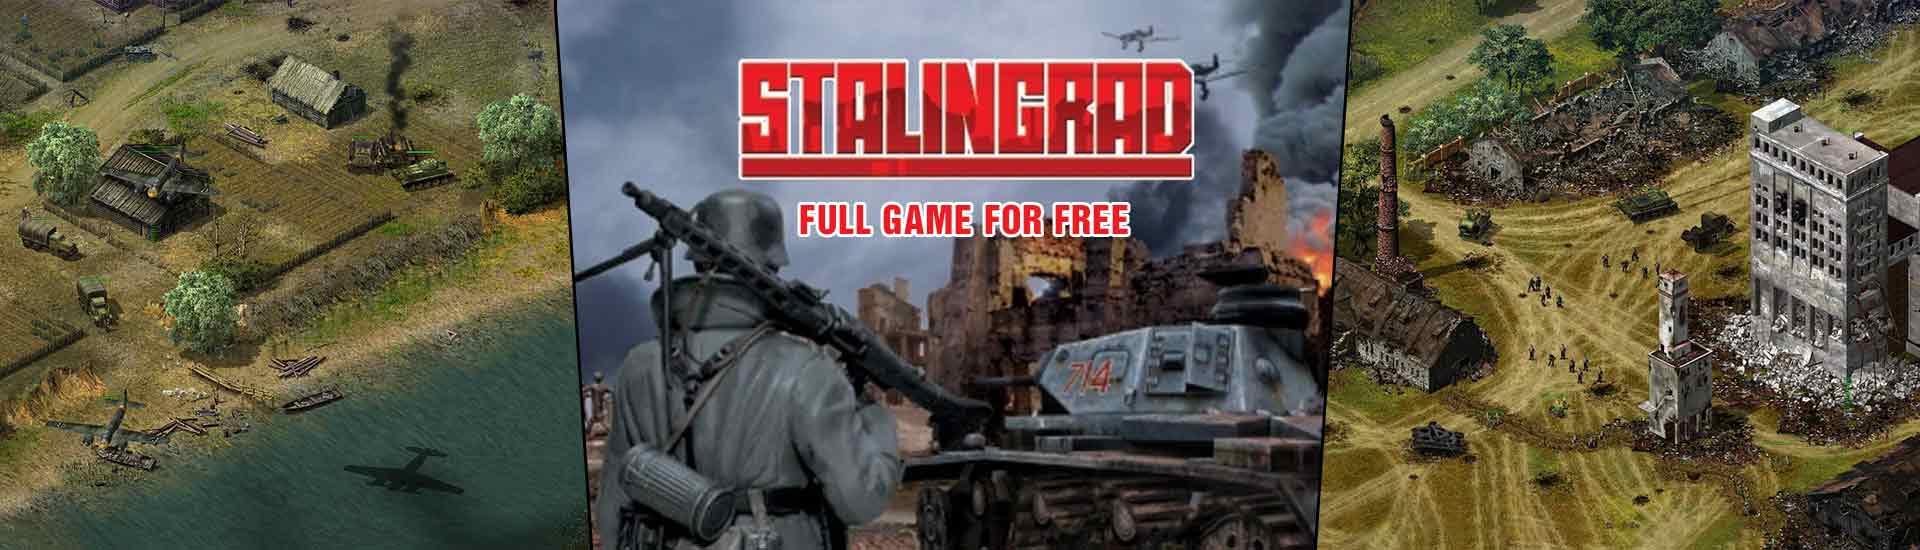 Stalingrad - PC Game